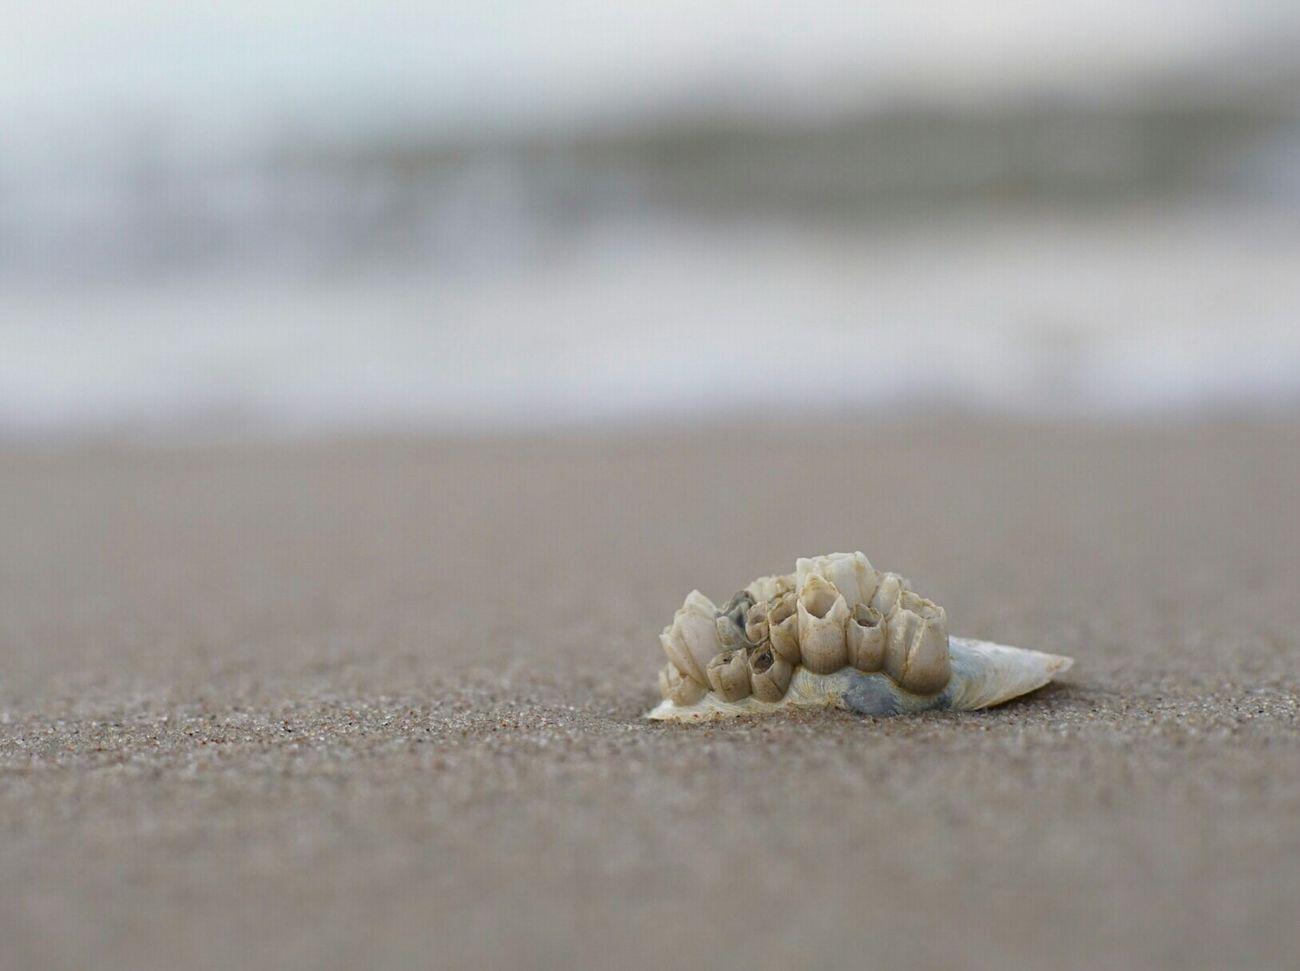 Ostsee Strand Sands Muschel Urlaub Holiday See Beach Muschelschalen Schell Polen